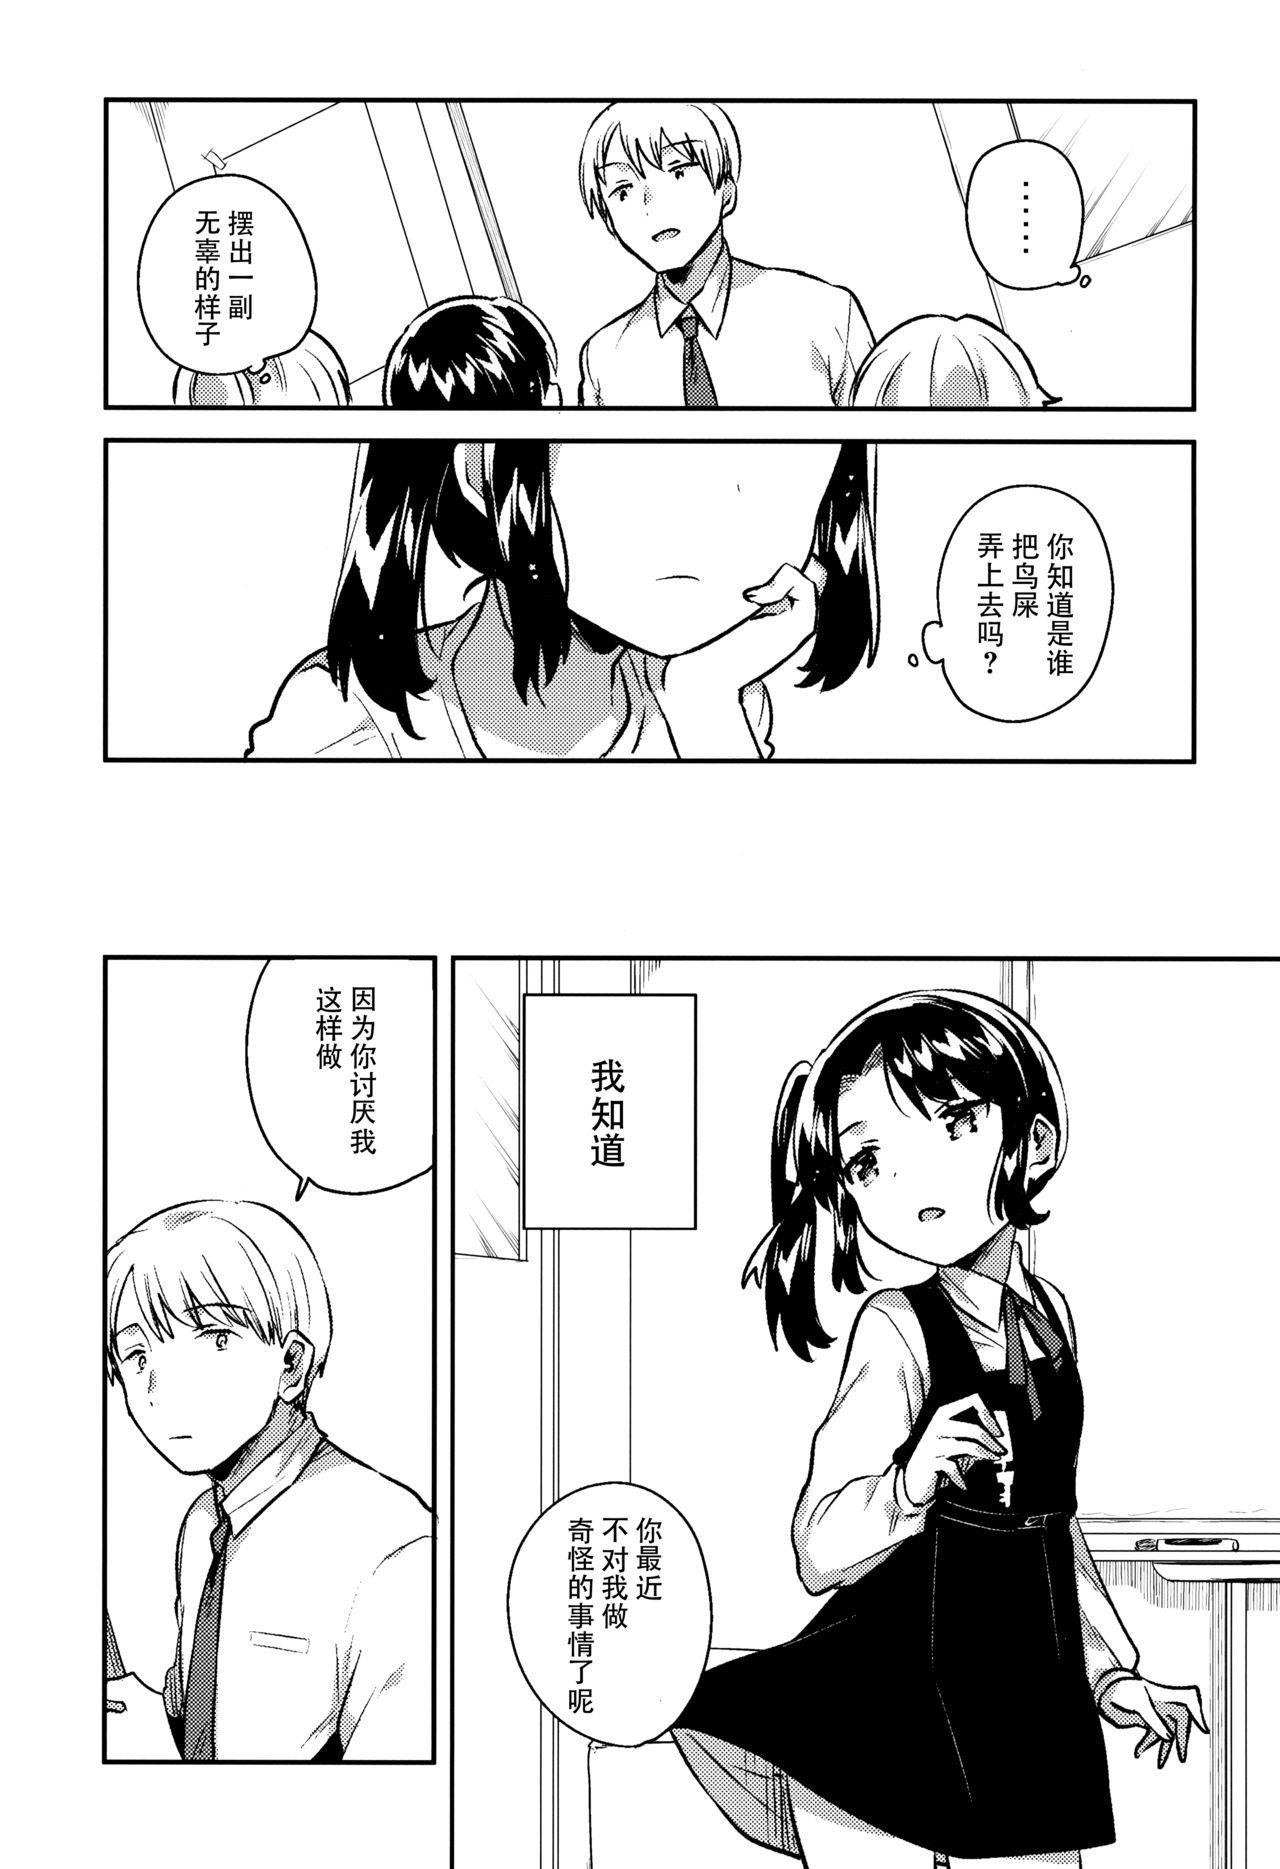 (SC2018 Spring) [squeezecandyheaven (Ichihaya)] Sensei wa Lolicon de Saitei Hentai no Gomikuzu [Zen] + Omake [Chinese] [脸肿汉化组] 8